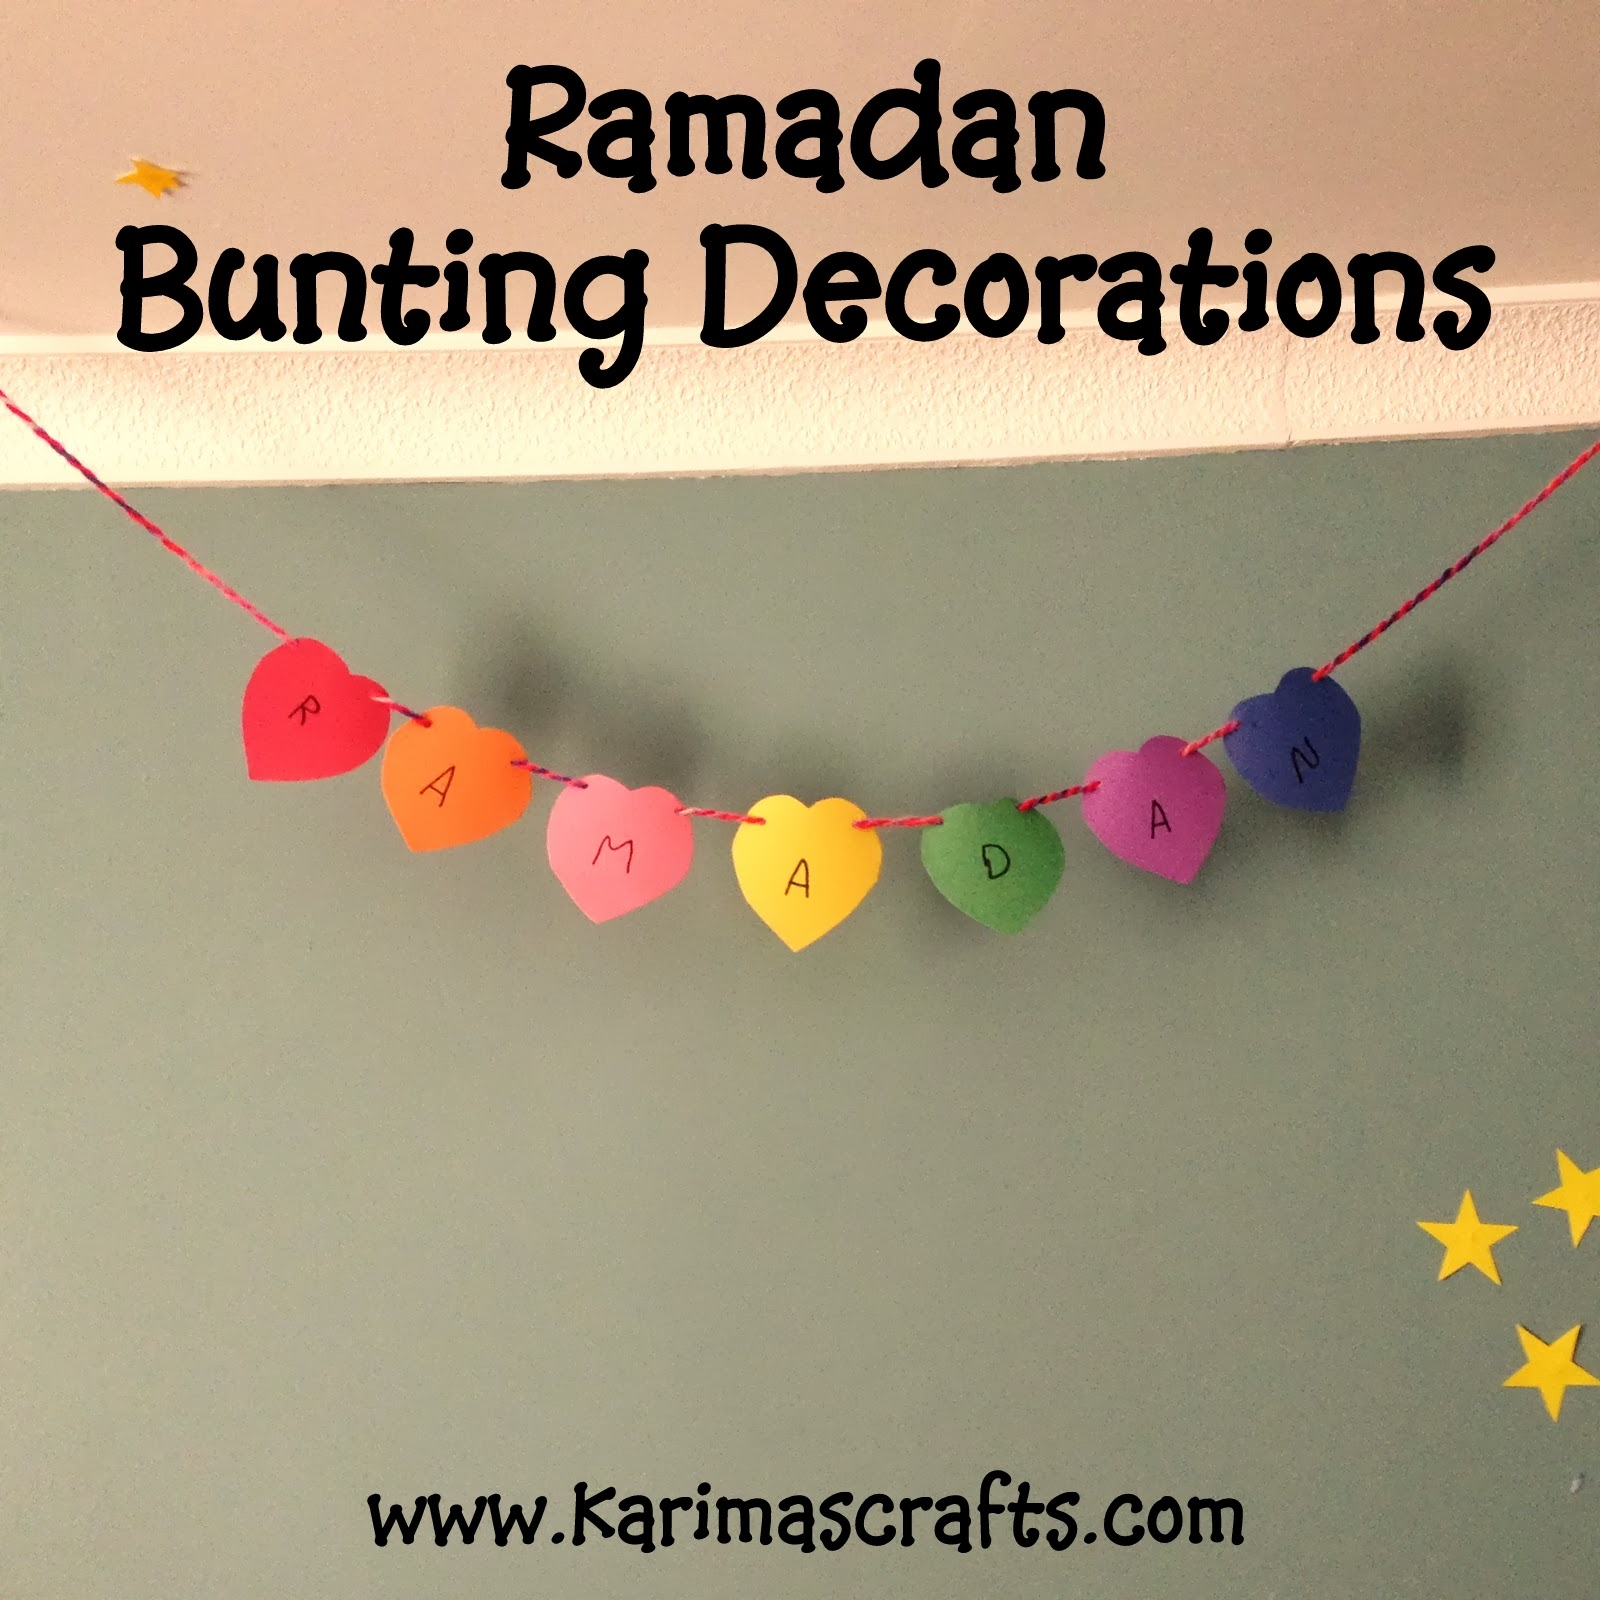 Wonderful 1 Day Ramadan Decor - IMG_3927+-+Copy  Pictures_321034.JPG